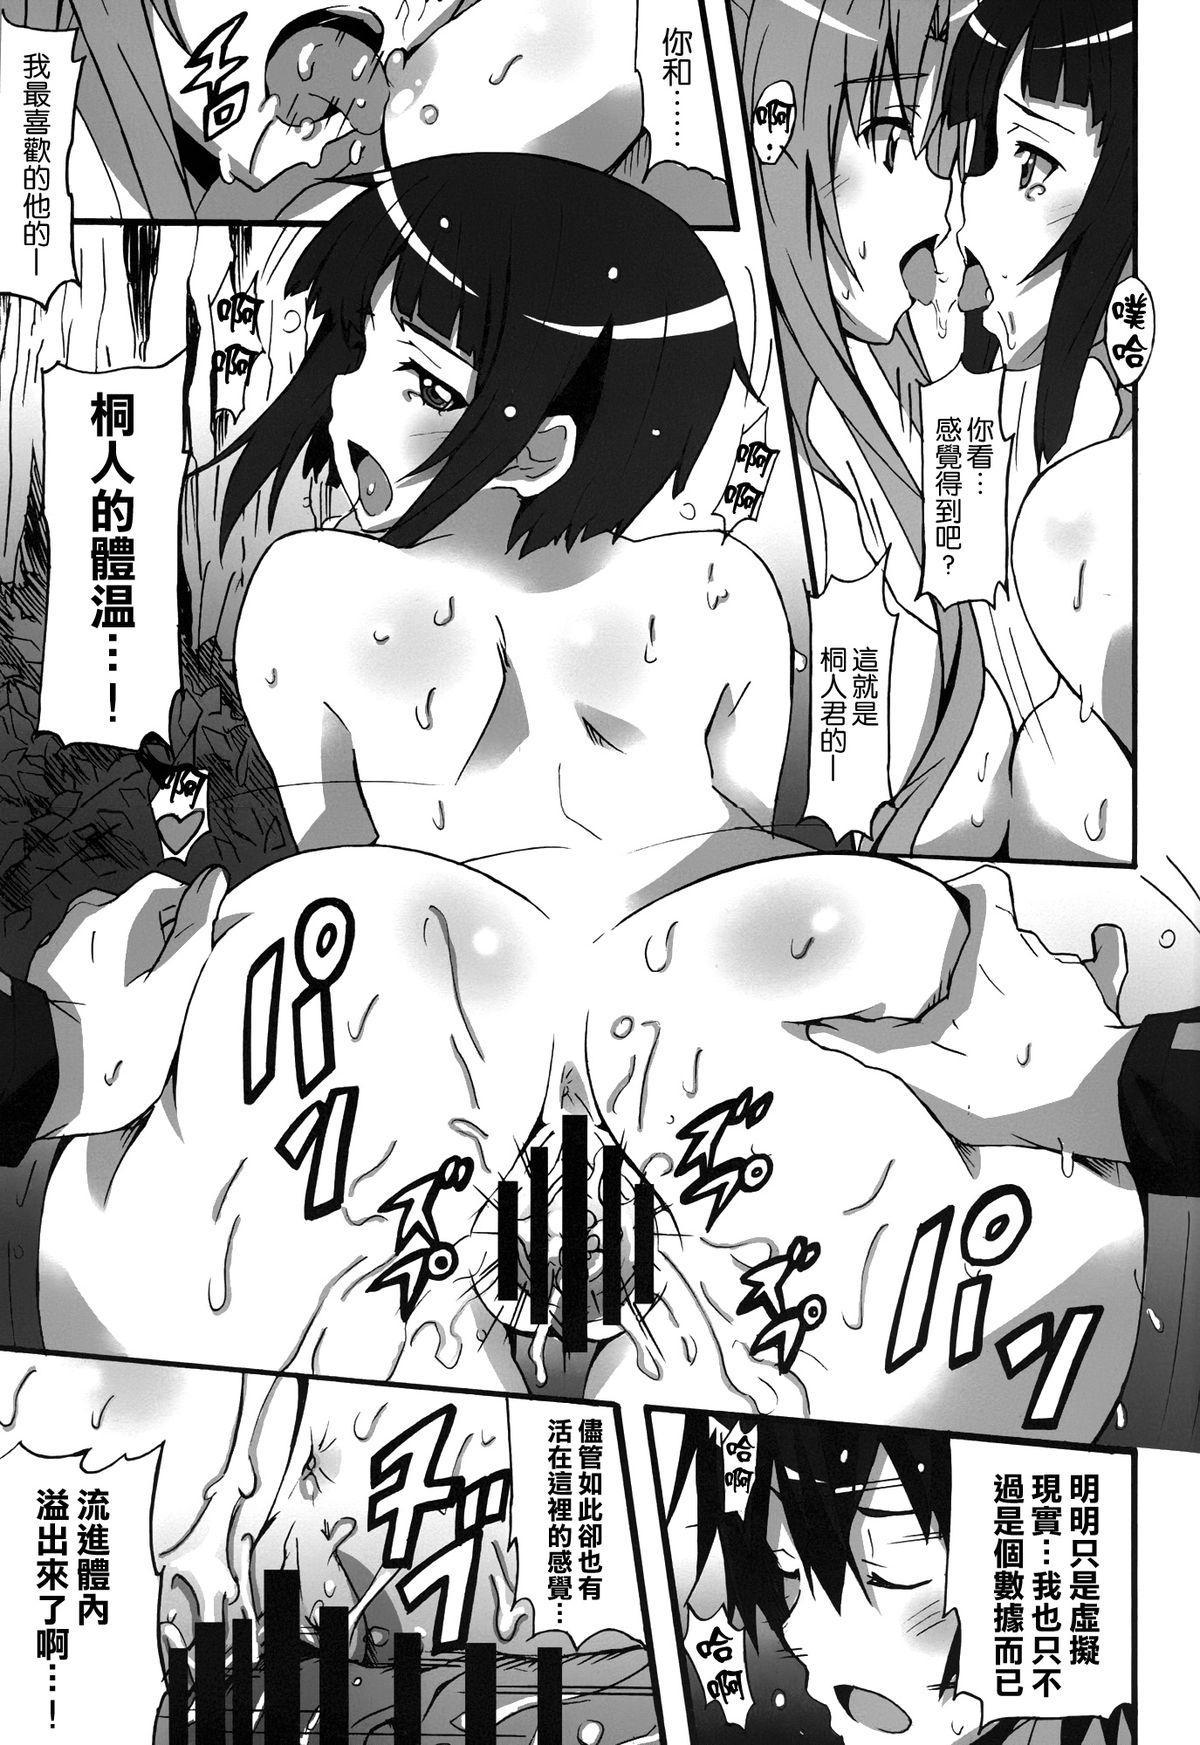 Sword Art Online Hollow Sensual 18